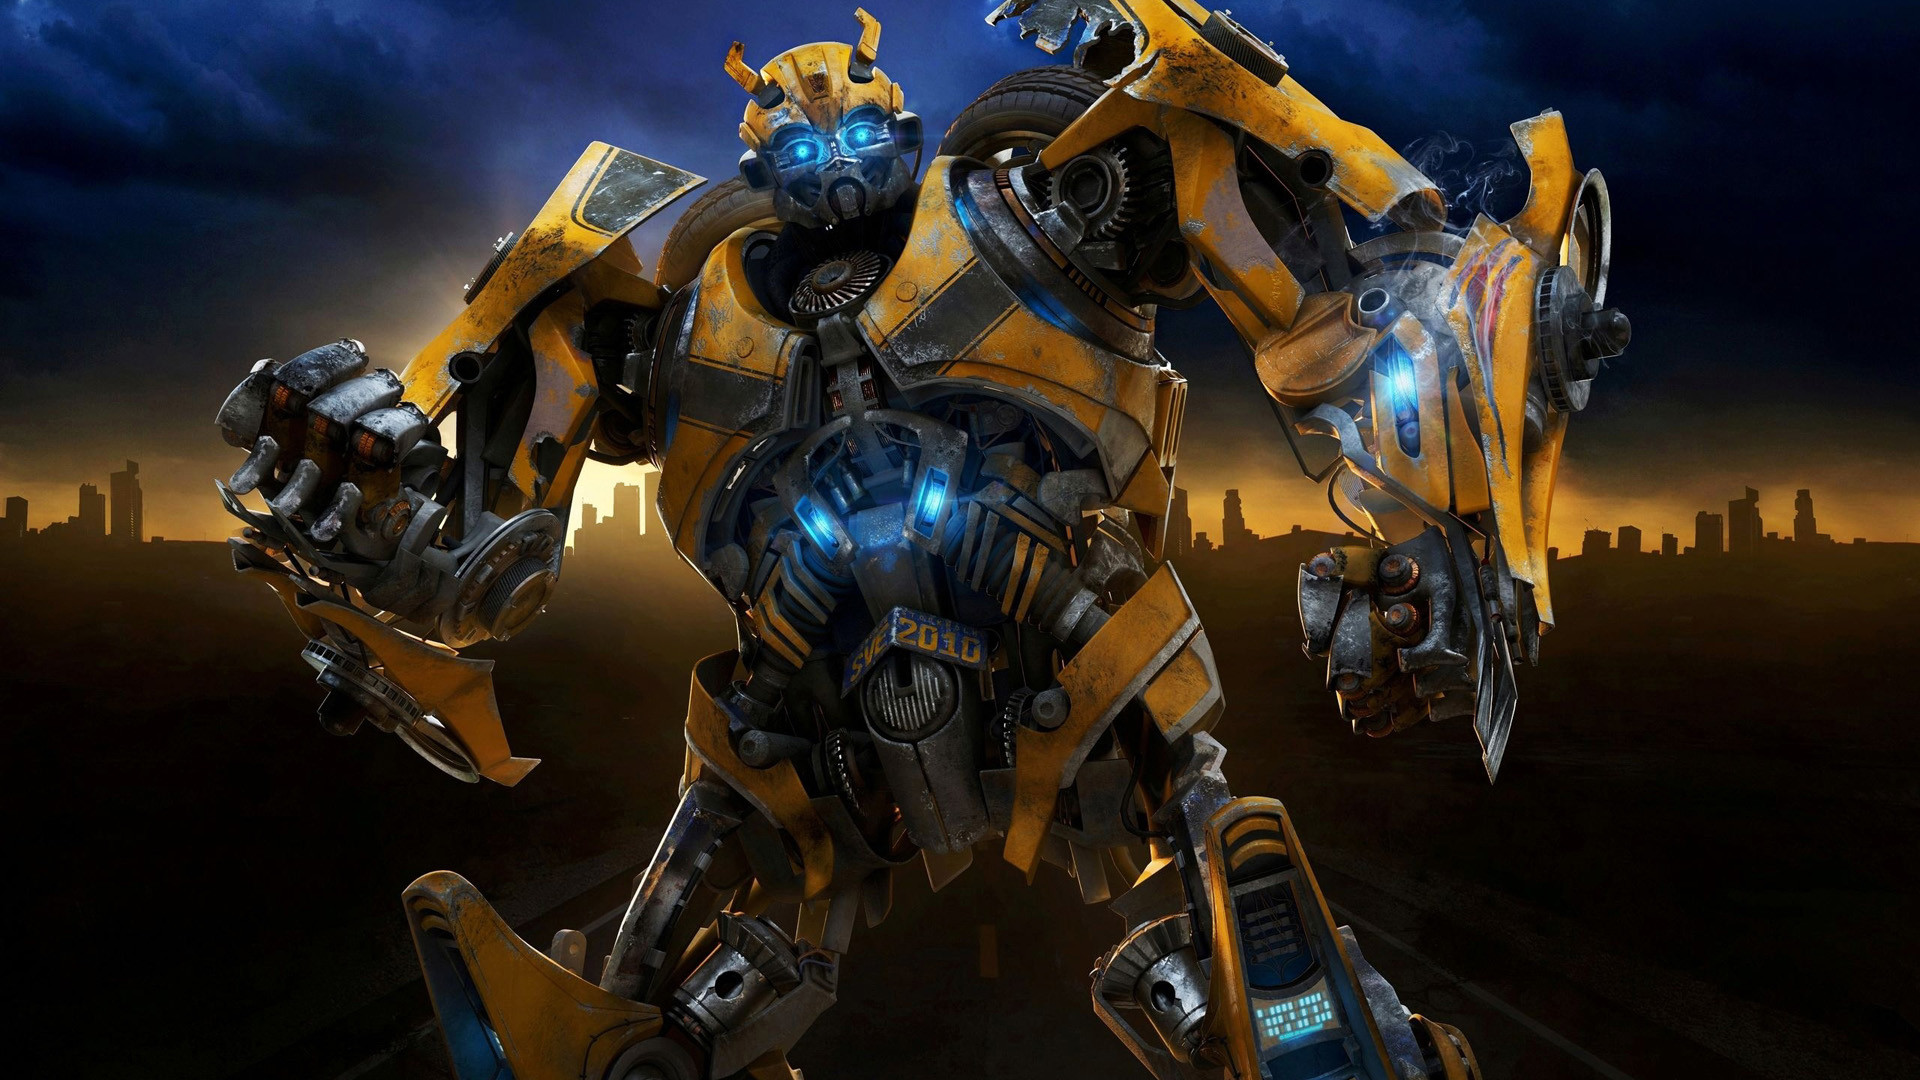 Transformers 3 Dark of the Moon Wallpapers (1920 x 1080 pixels) – Digital  Citizen